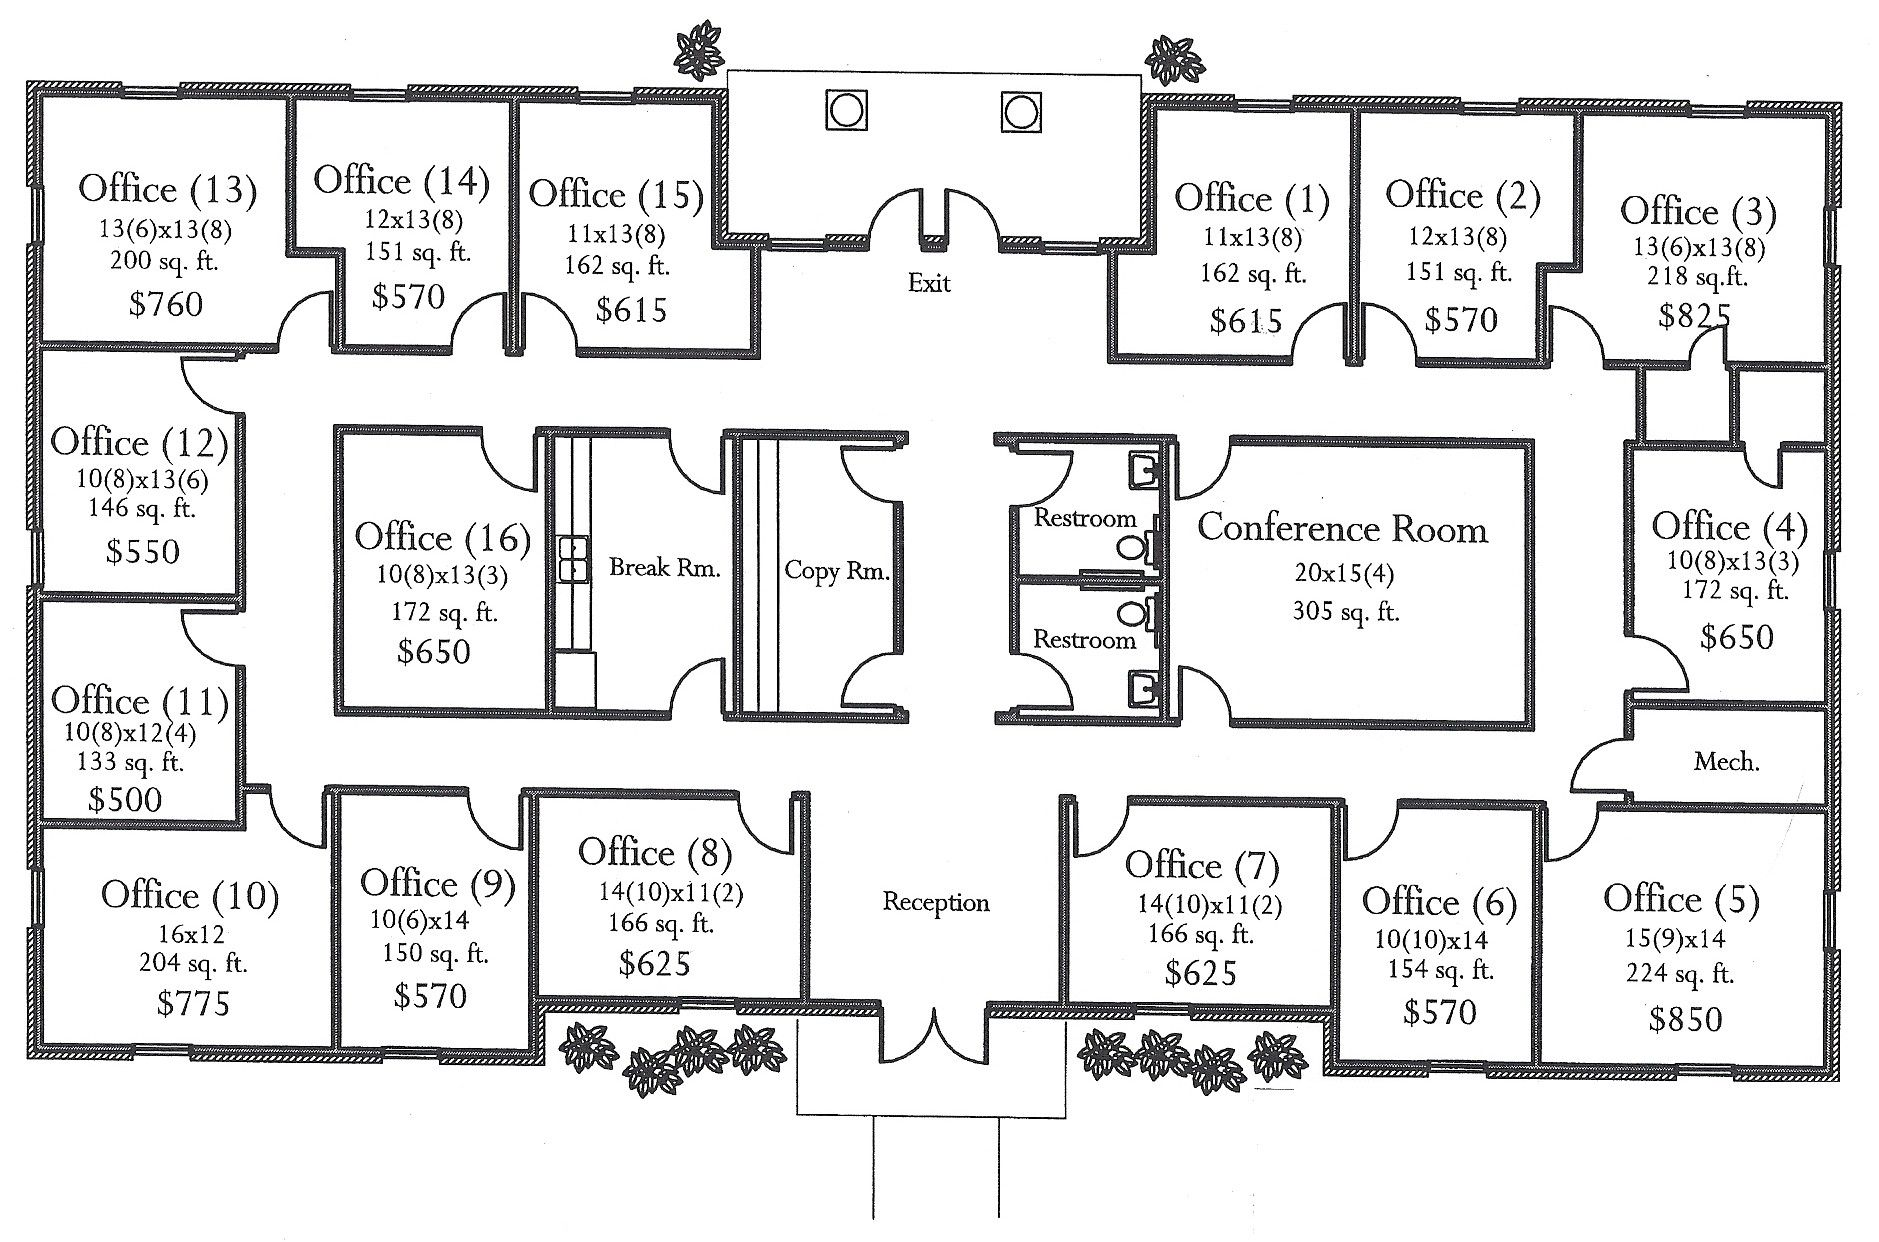 Office Building Floor Plans Examples   Atcsagacity.com